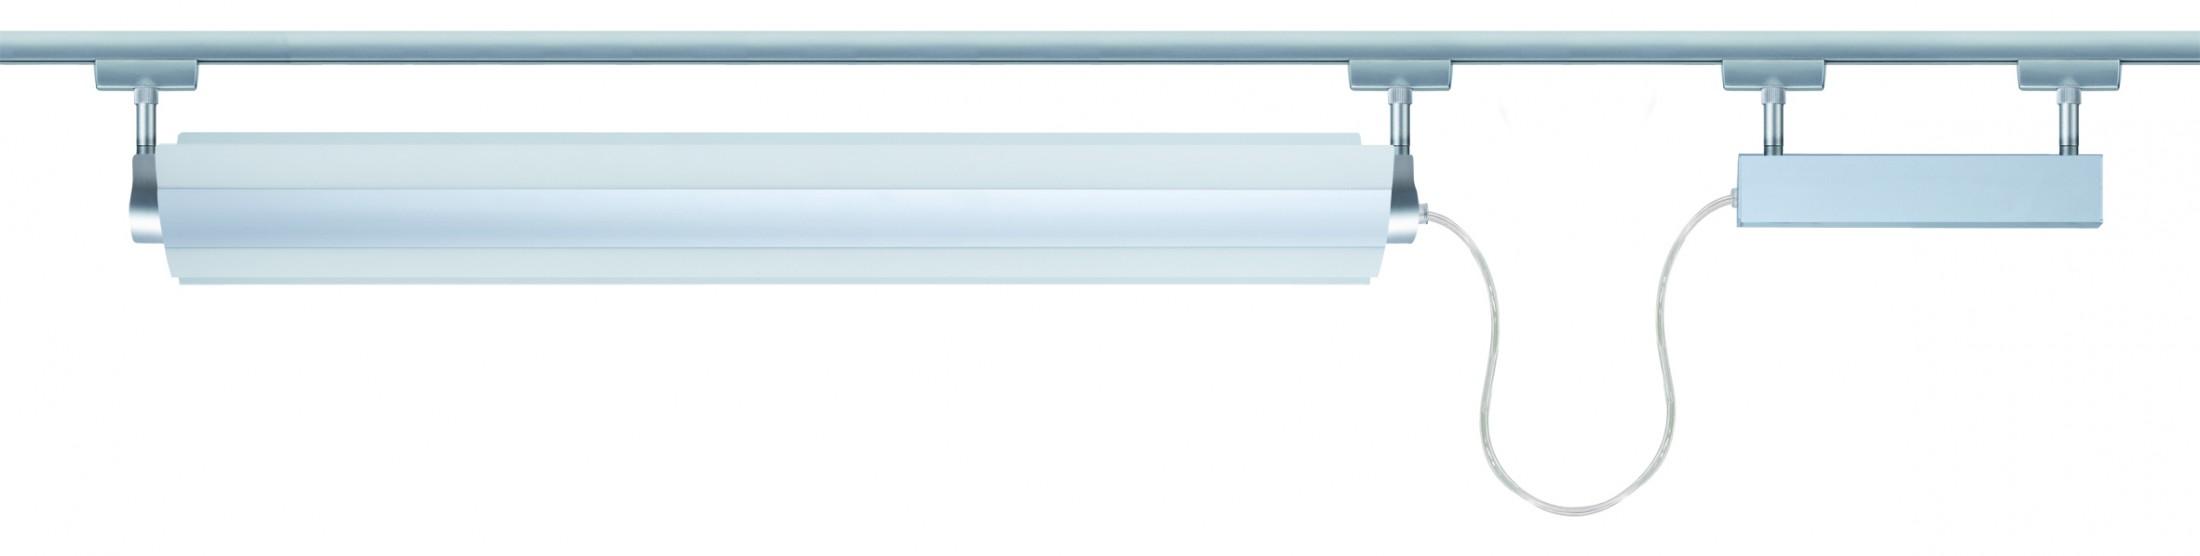 paulmann u rail einzelteile rail system light easy. Black Bedroom Furniture Sets. Home Design Ideas